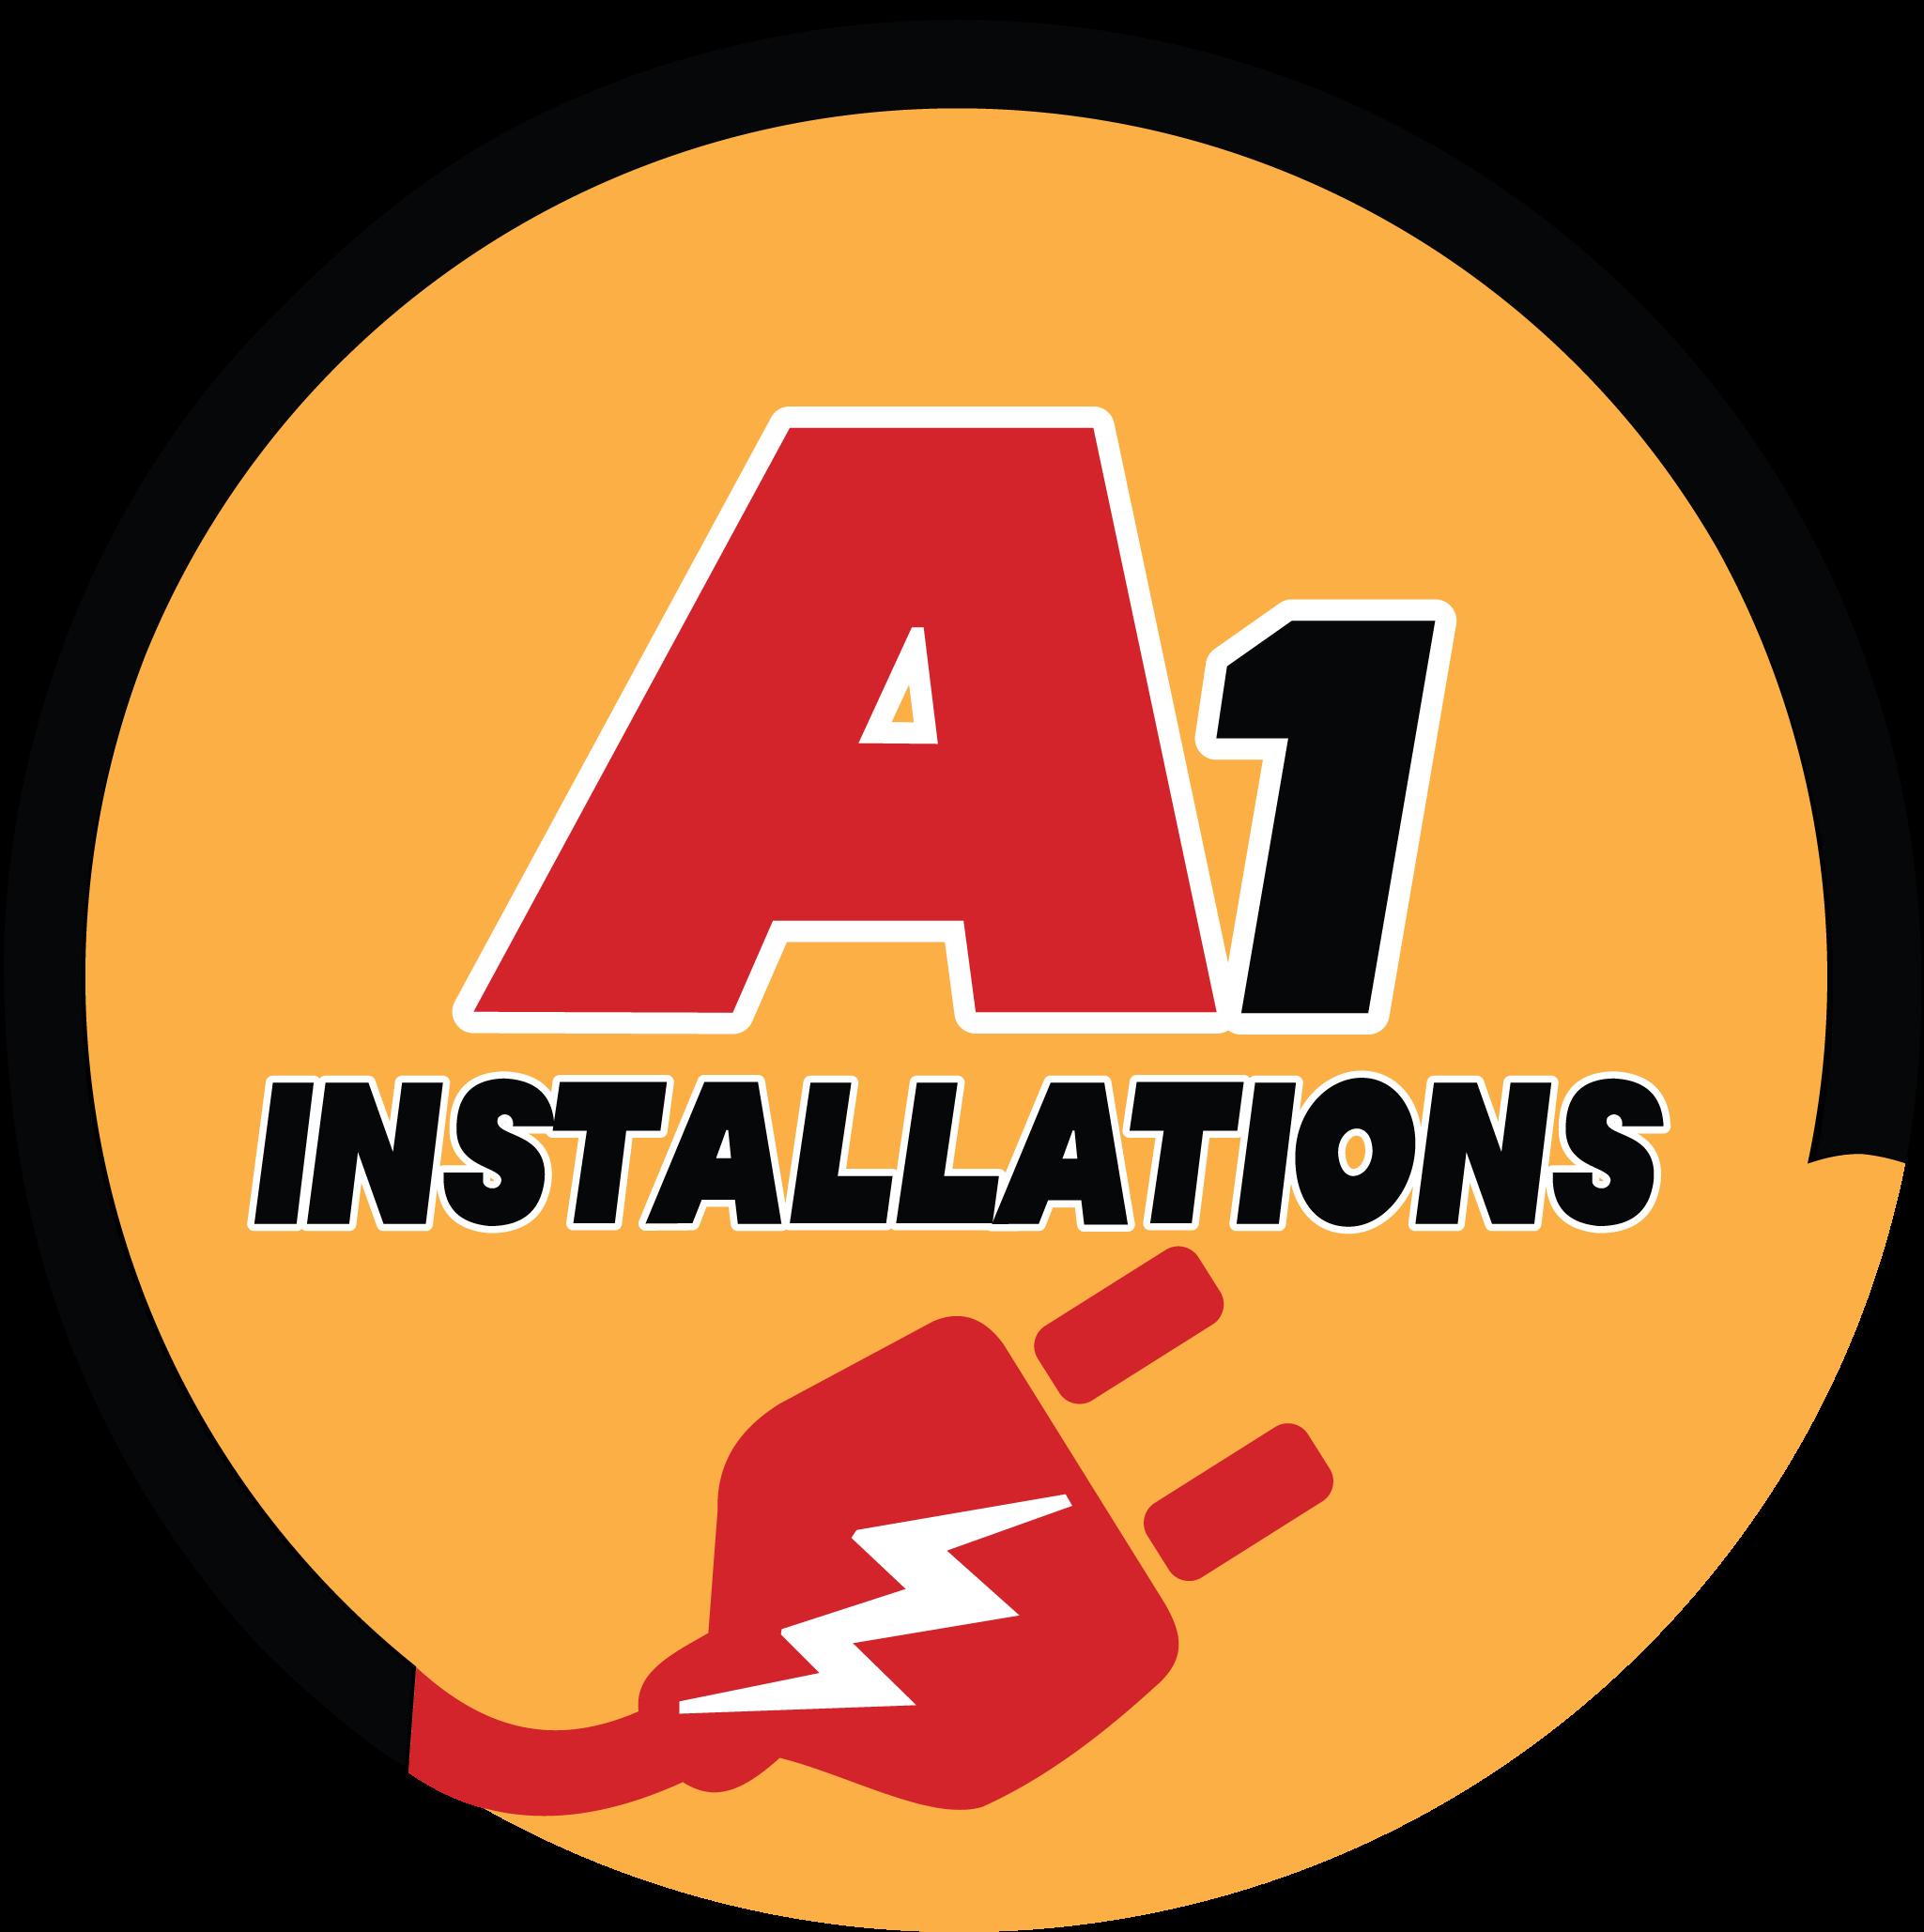 A1 Installations LLC